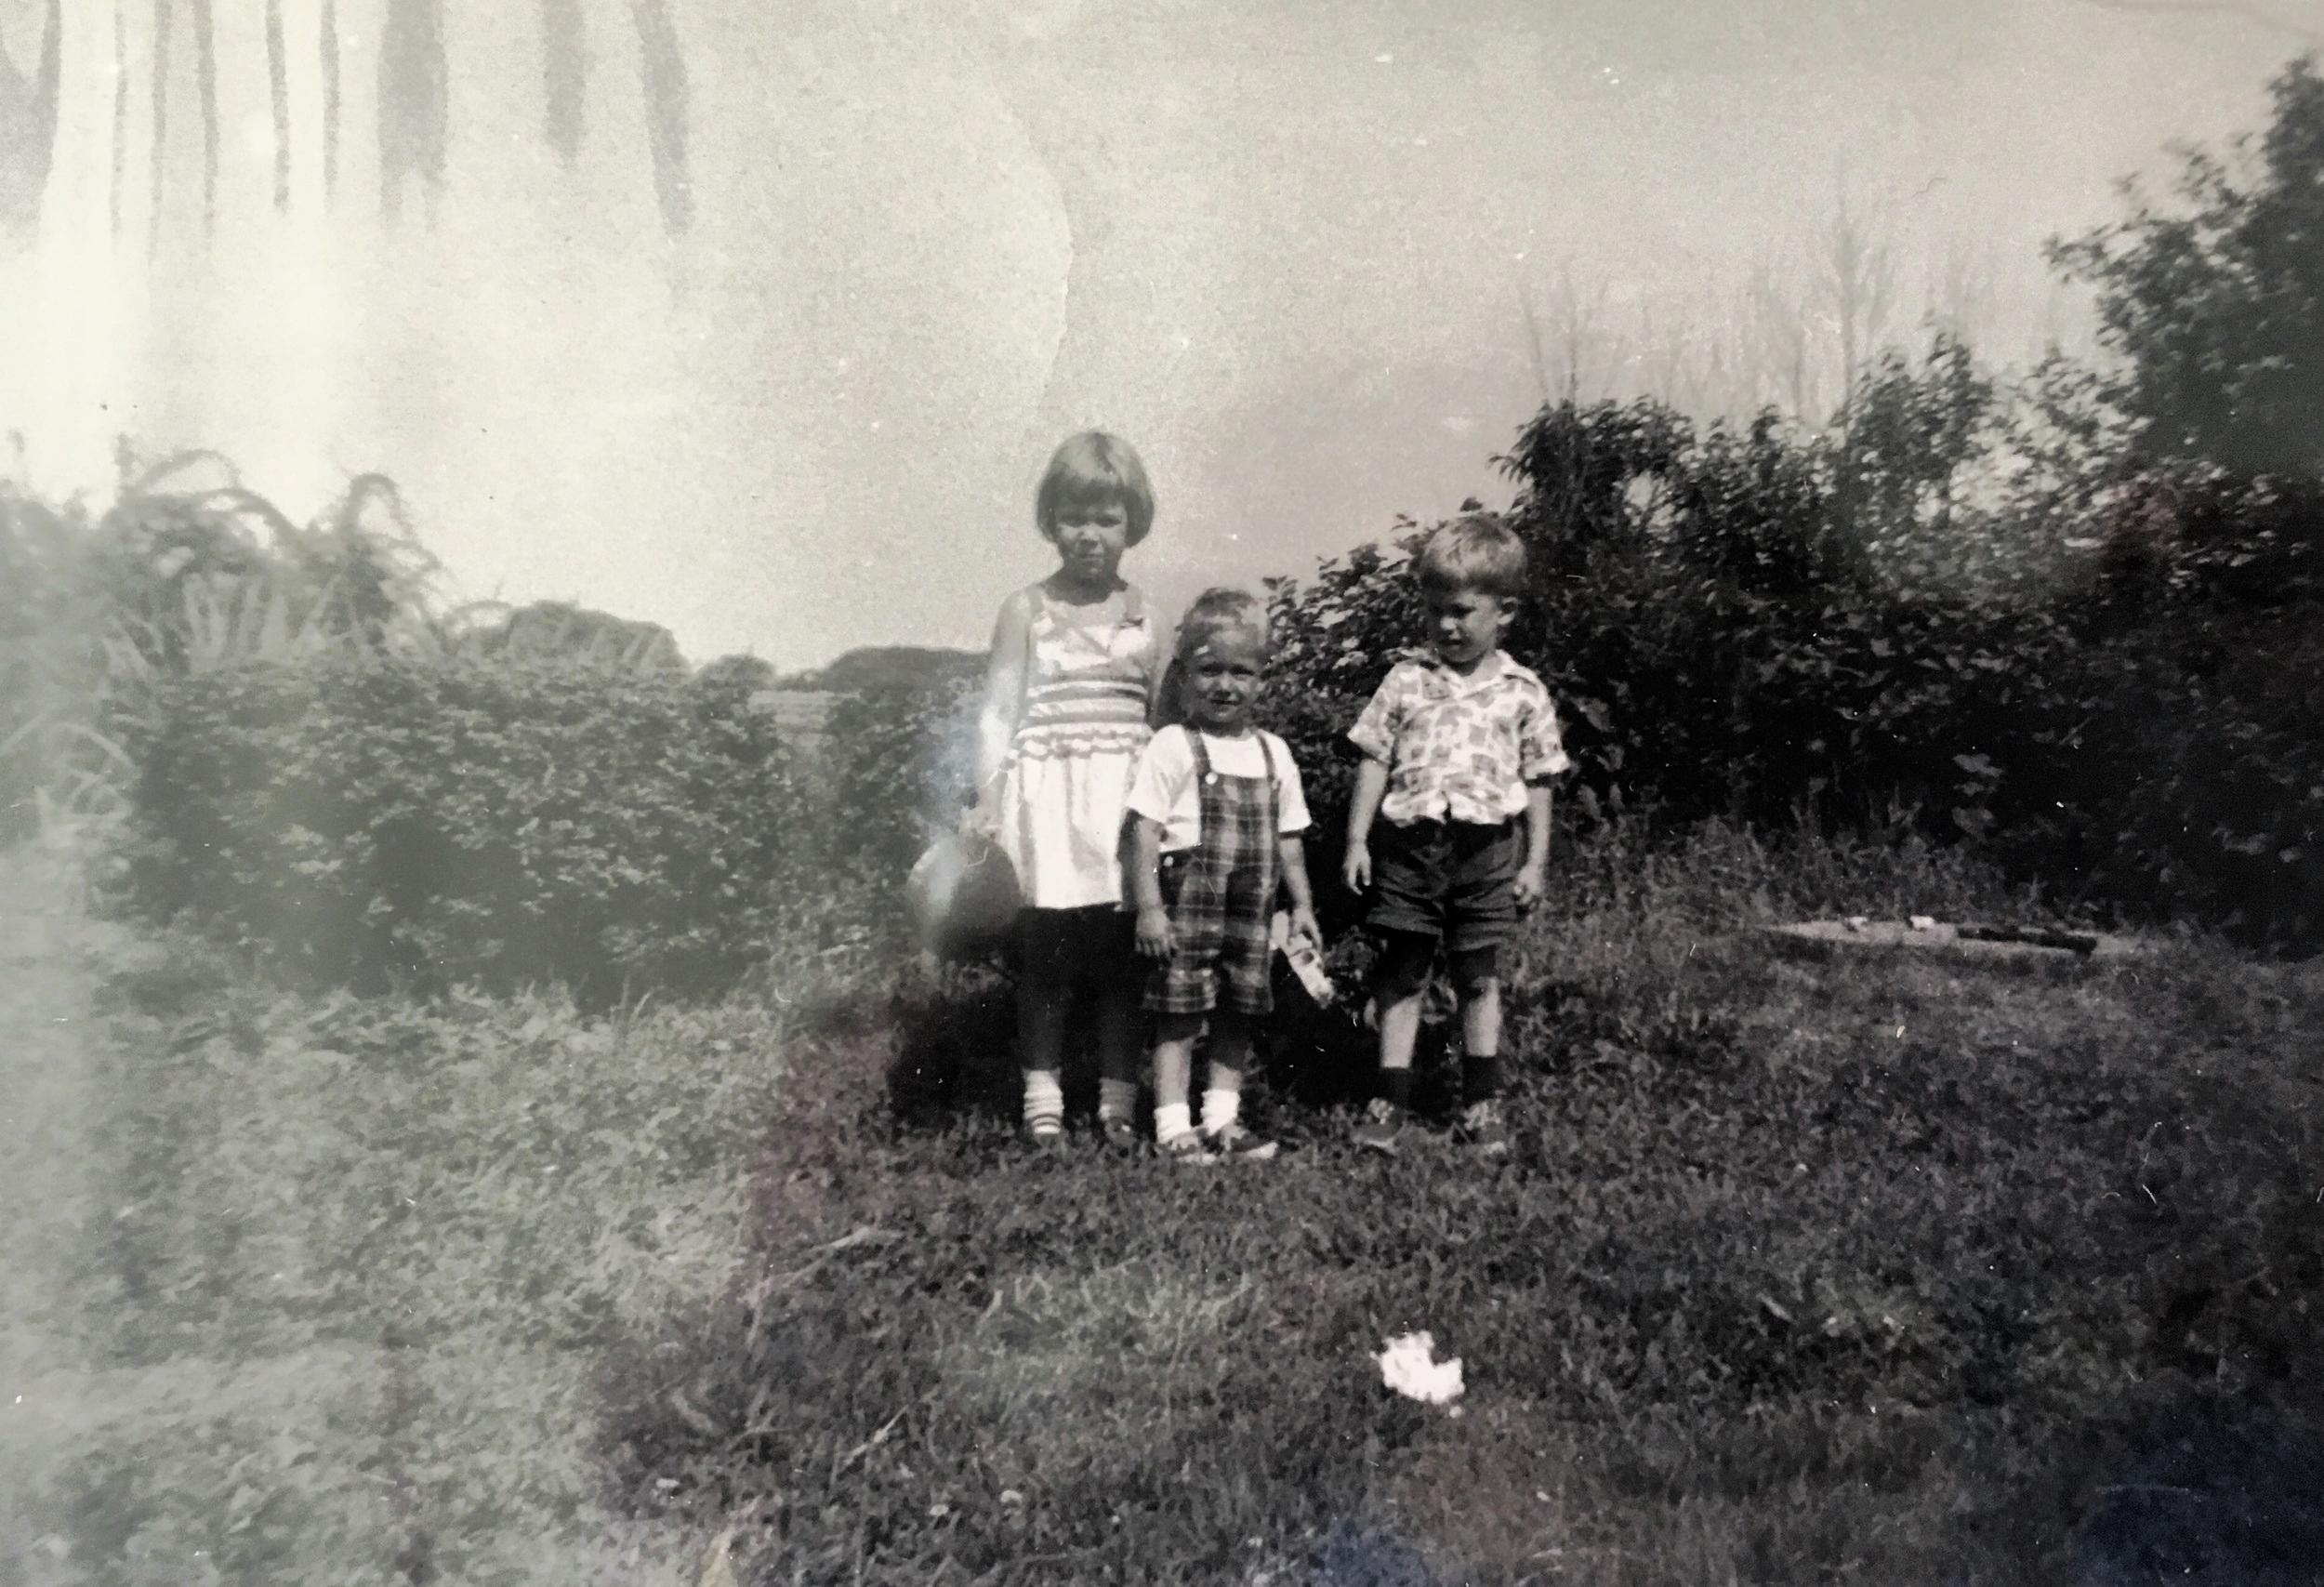 At Art's 2nd birthday, 1953.